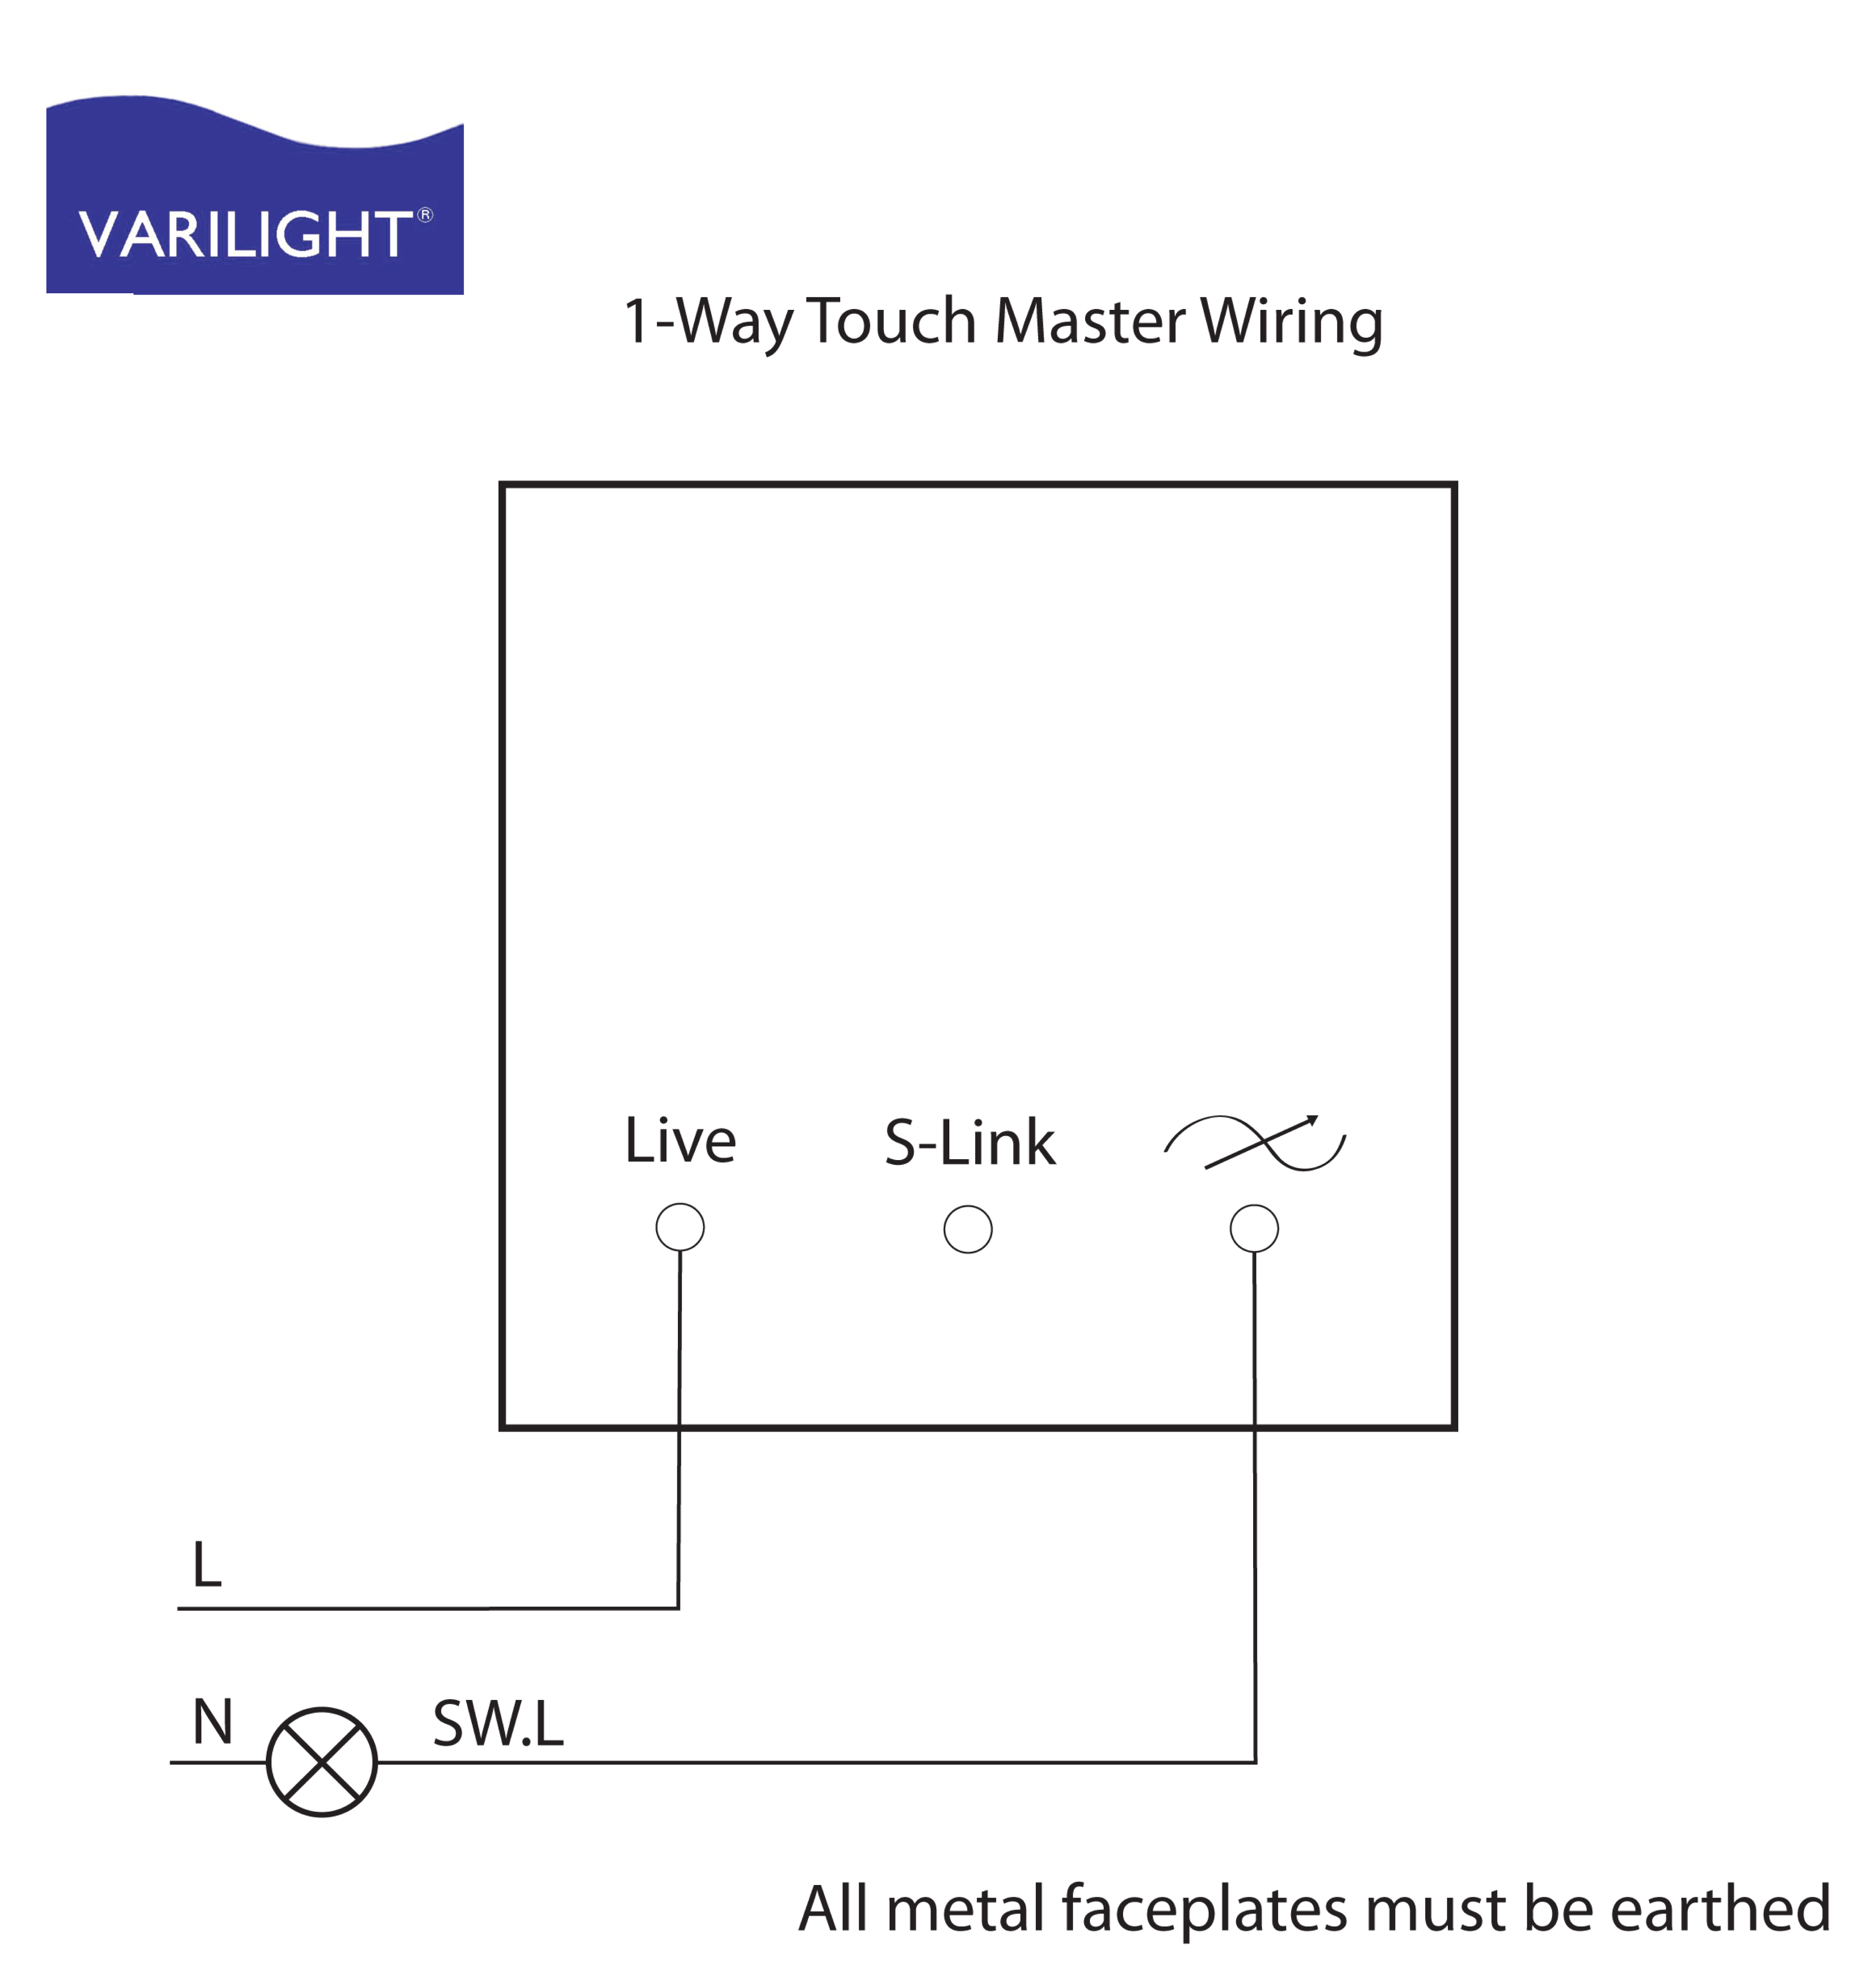 Varilight Wiring Diagrams - Dimmer Switch Wiring Diagram